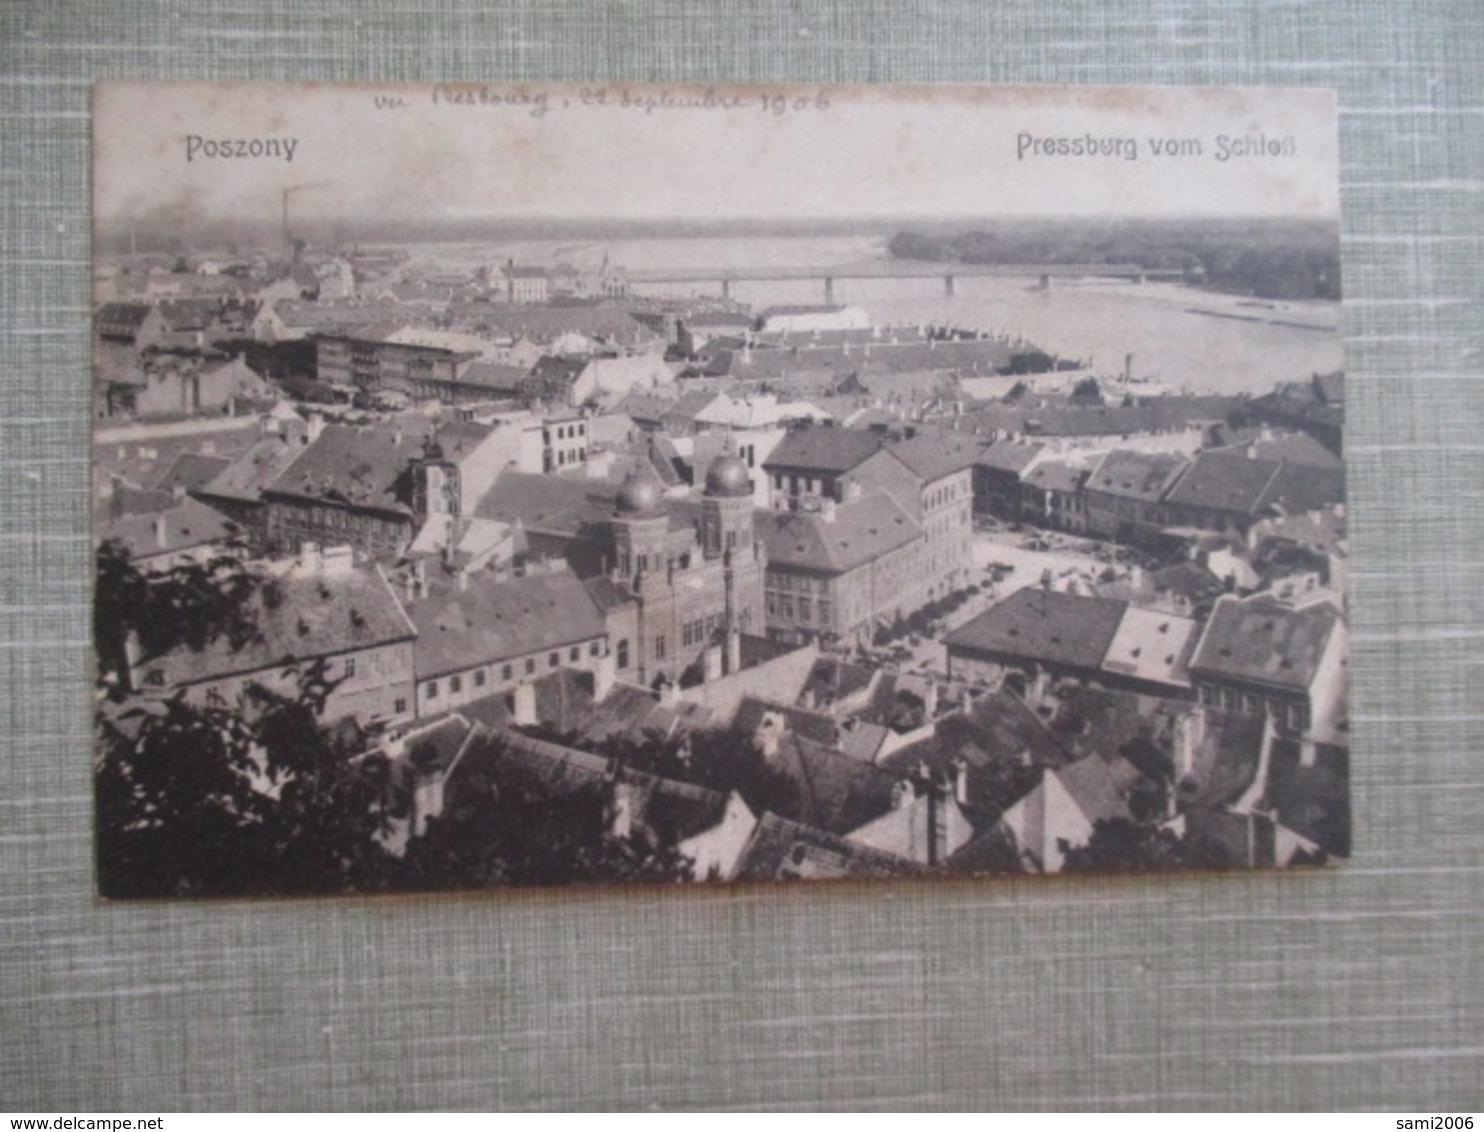 CPA SLOVAQUIE POSZONY PRESSBURG VOM SCHLEB - Slovaquie